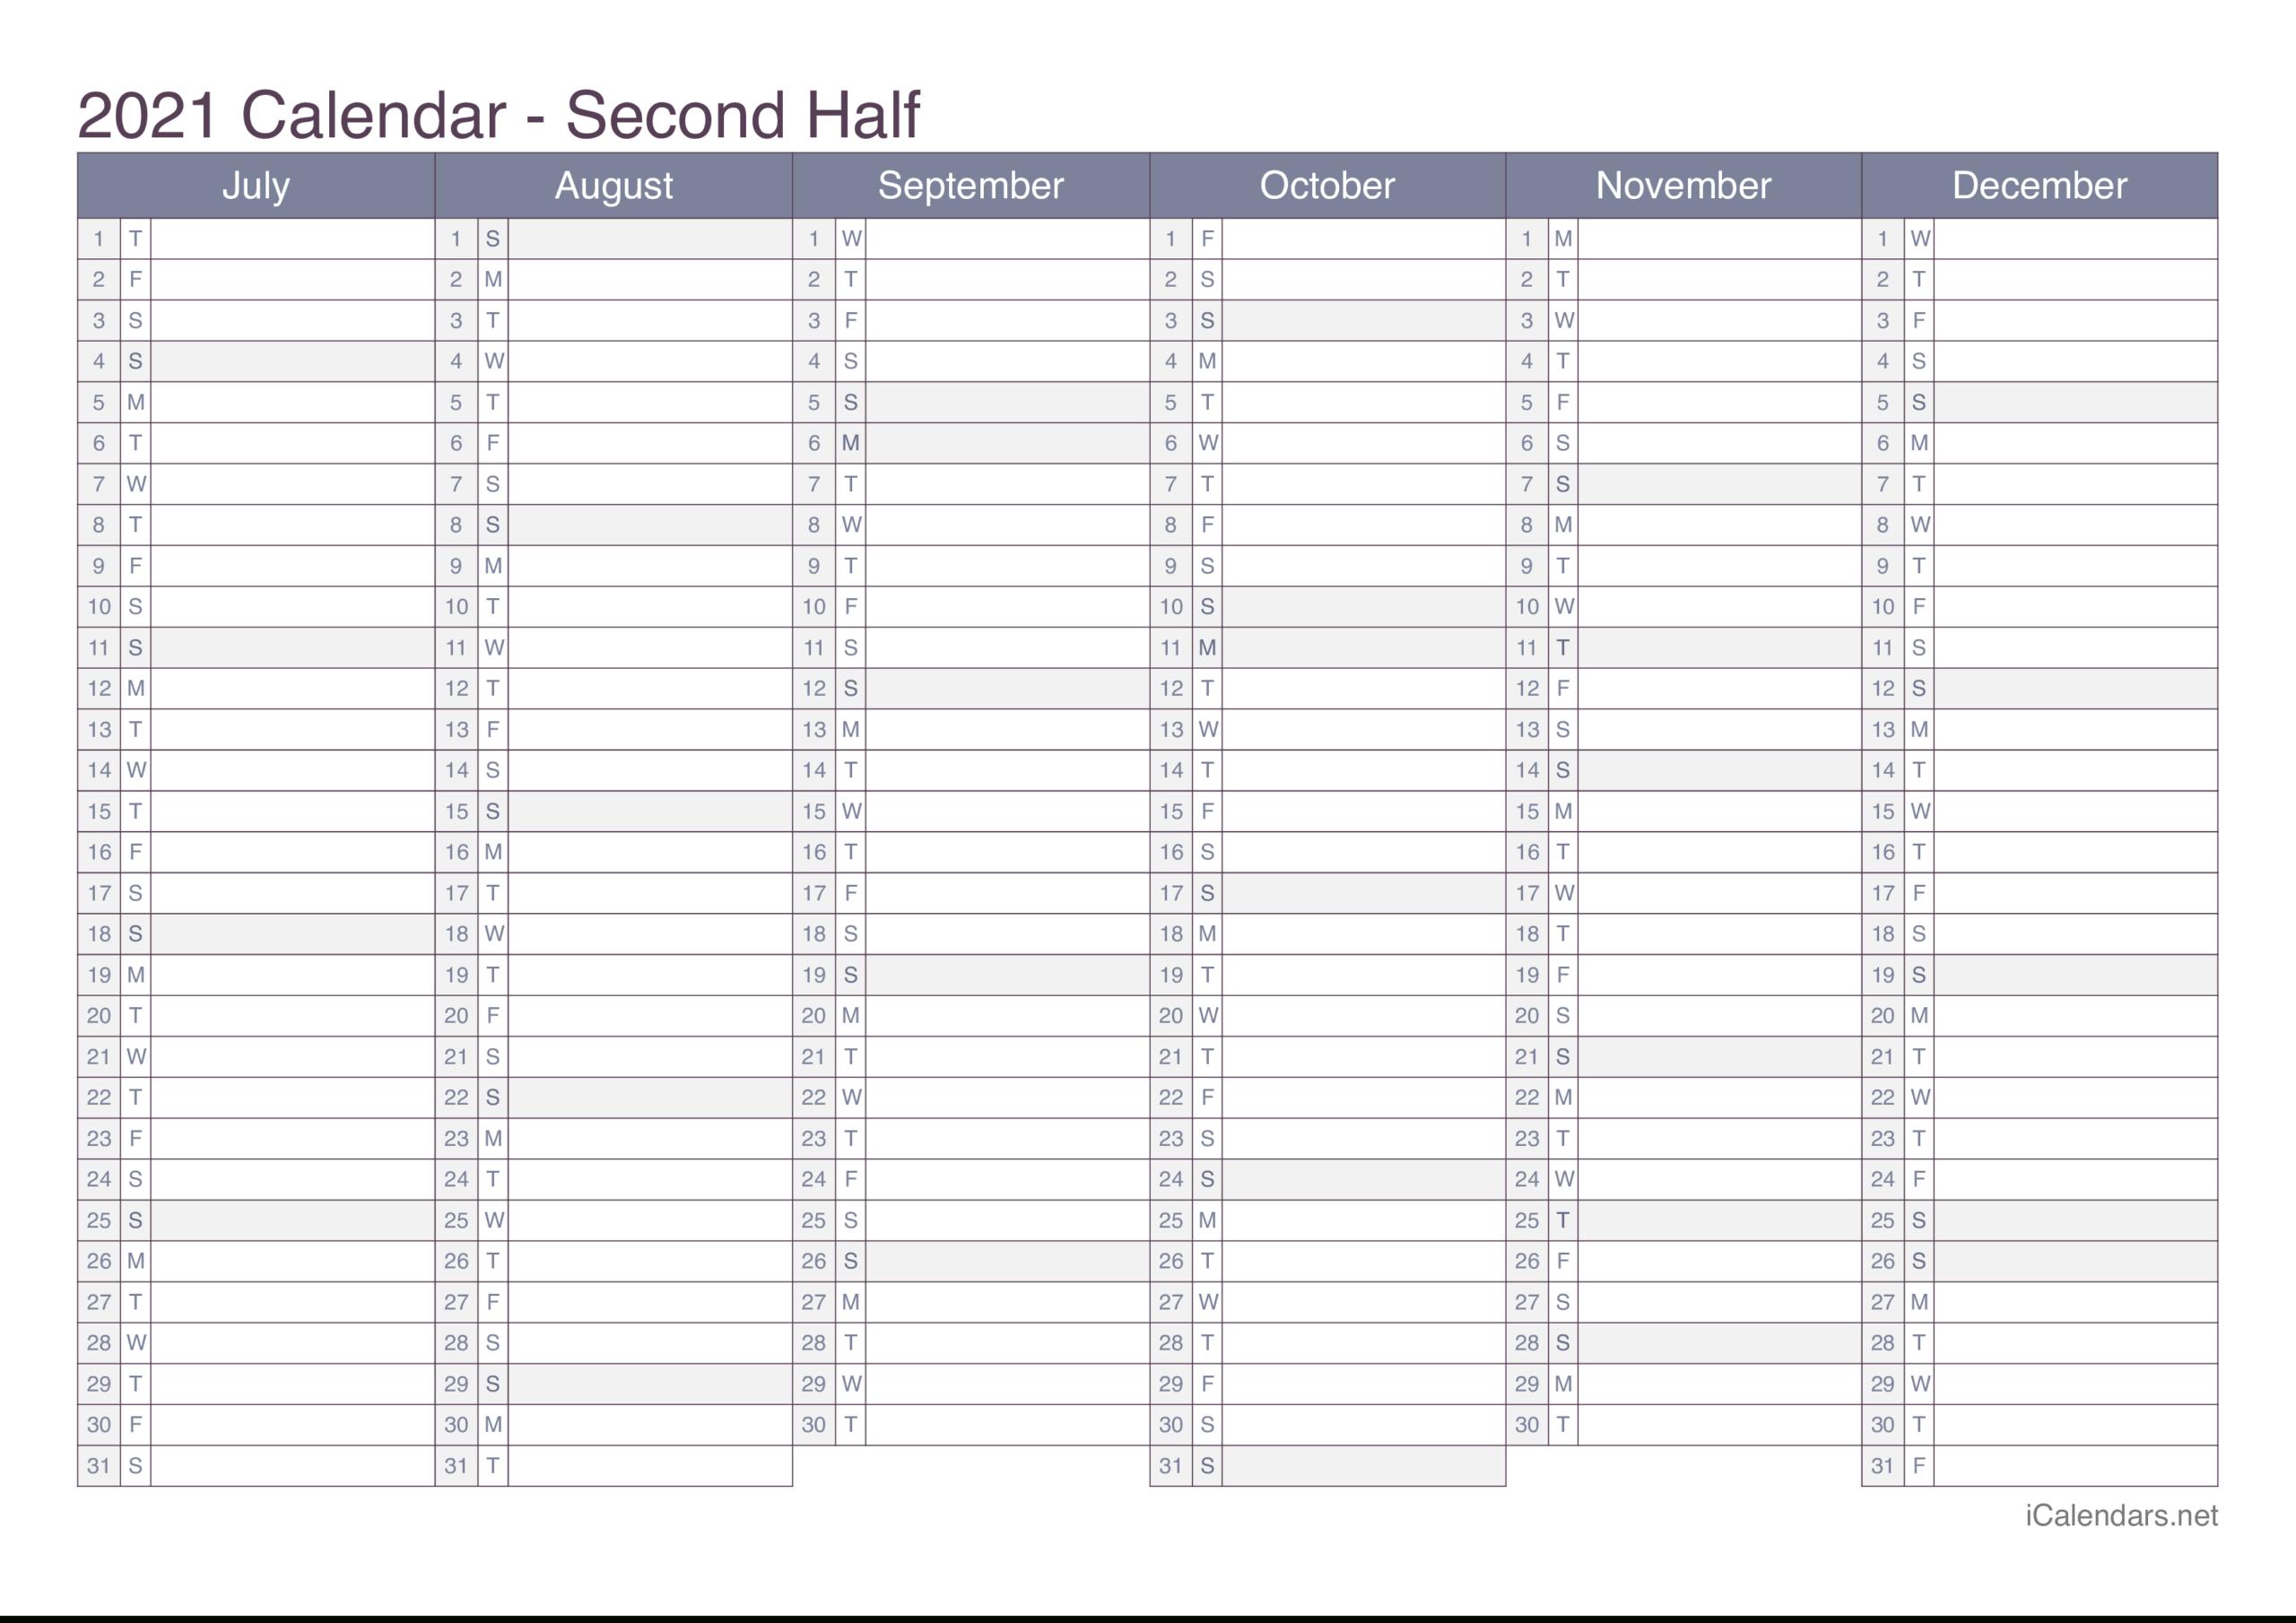 2021 Printable Calendar - Pdf Or Excel - Icalendars in 2021 Fill-In Calendar